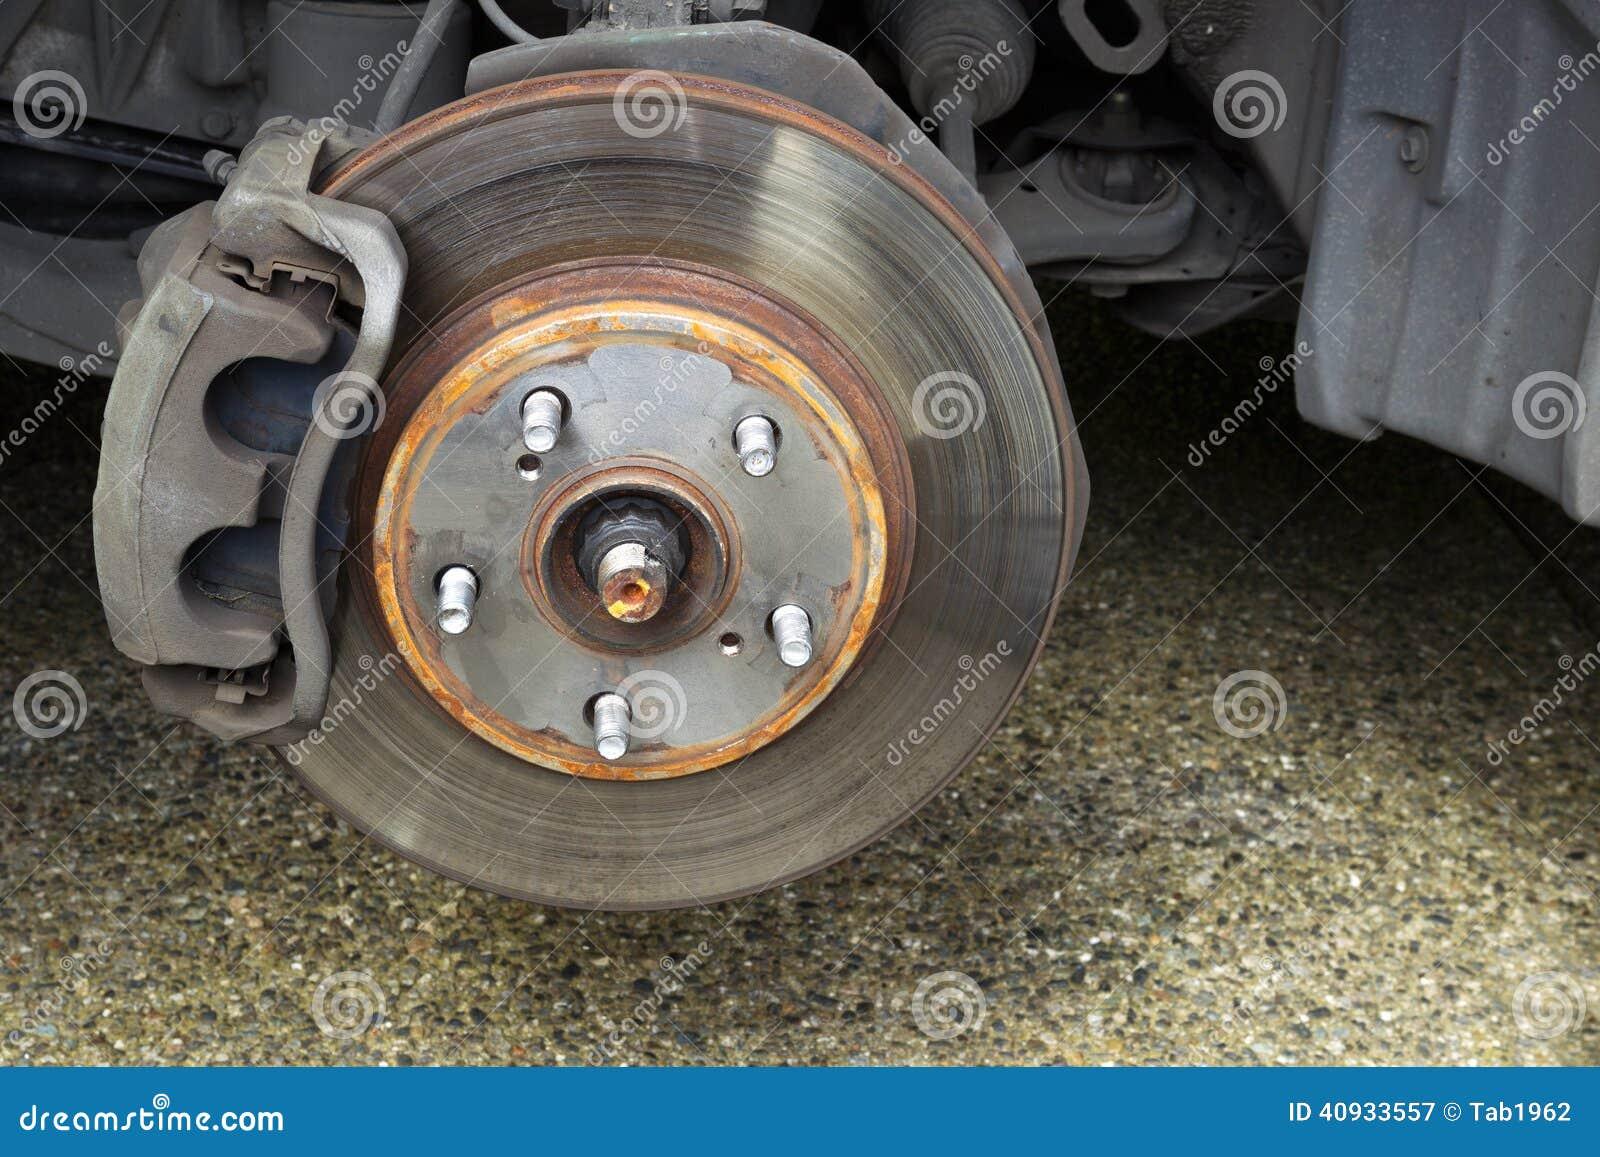 repairing brakes on car stock image image of service 40933557. Black Bedroom Furniture Sets. Home Design Ideas